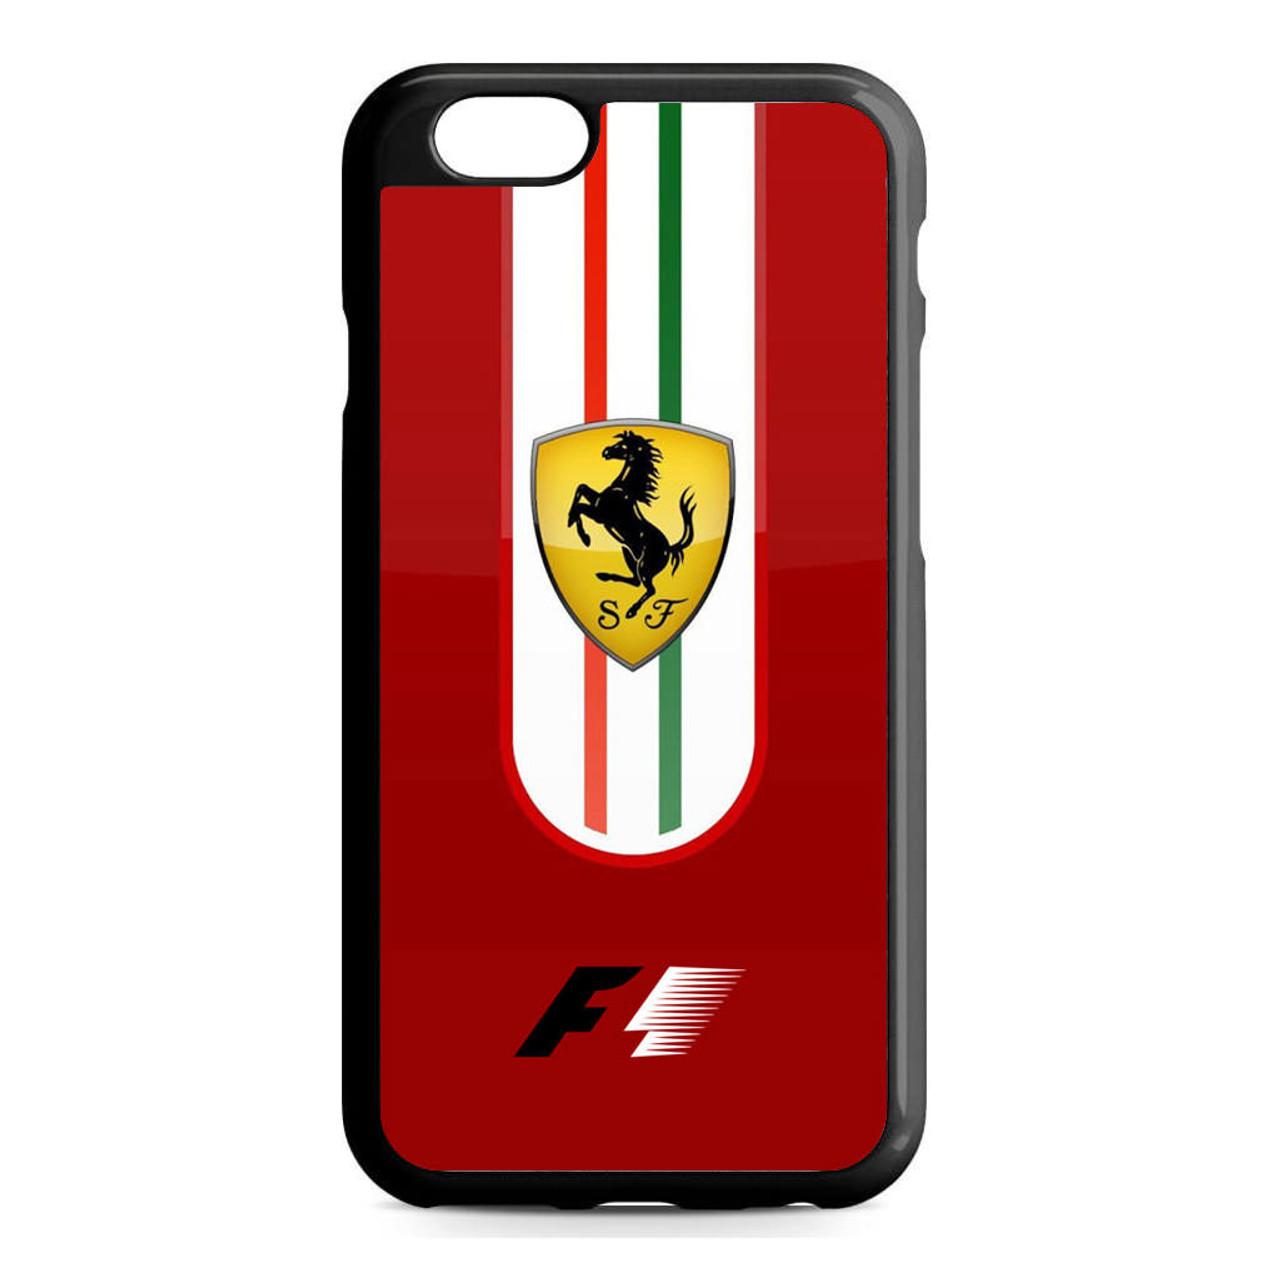 iphone 6s f1 case